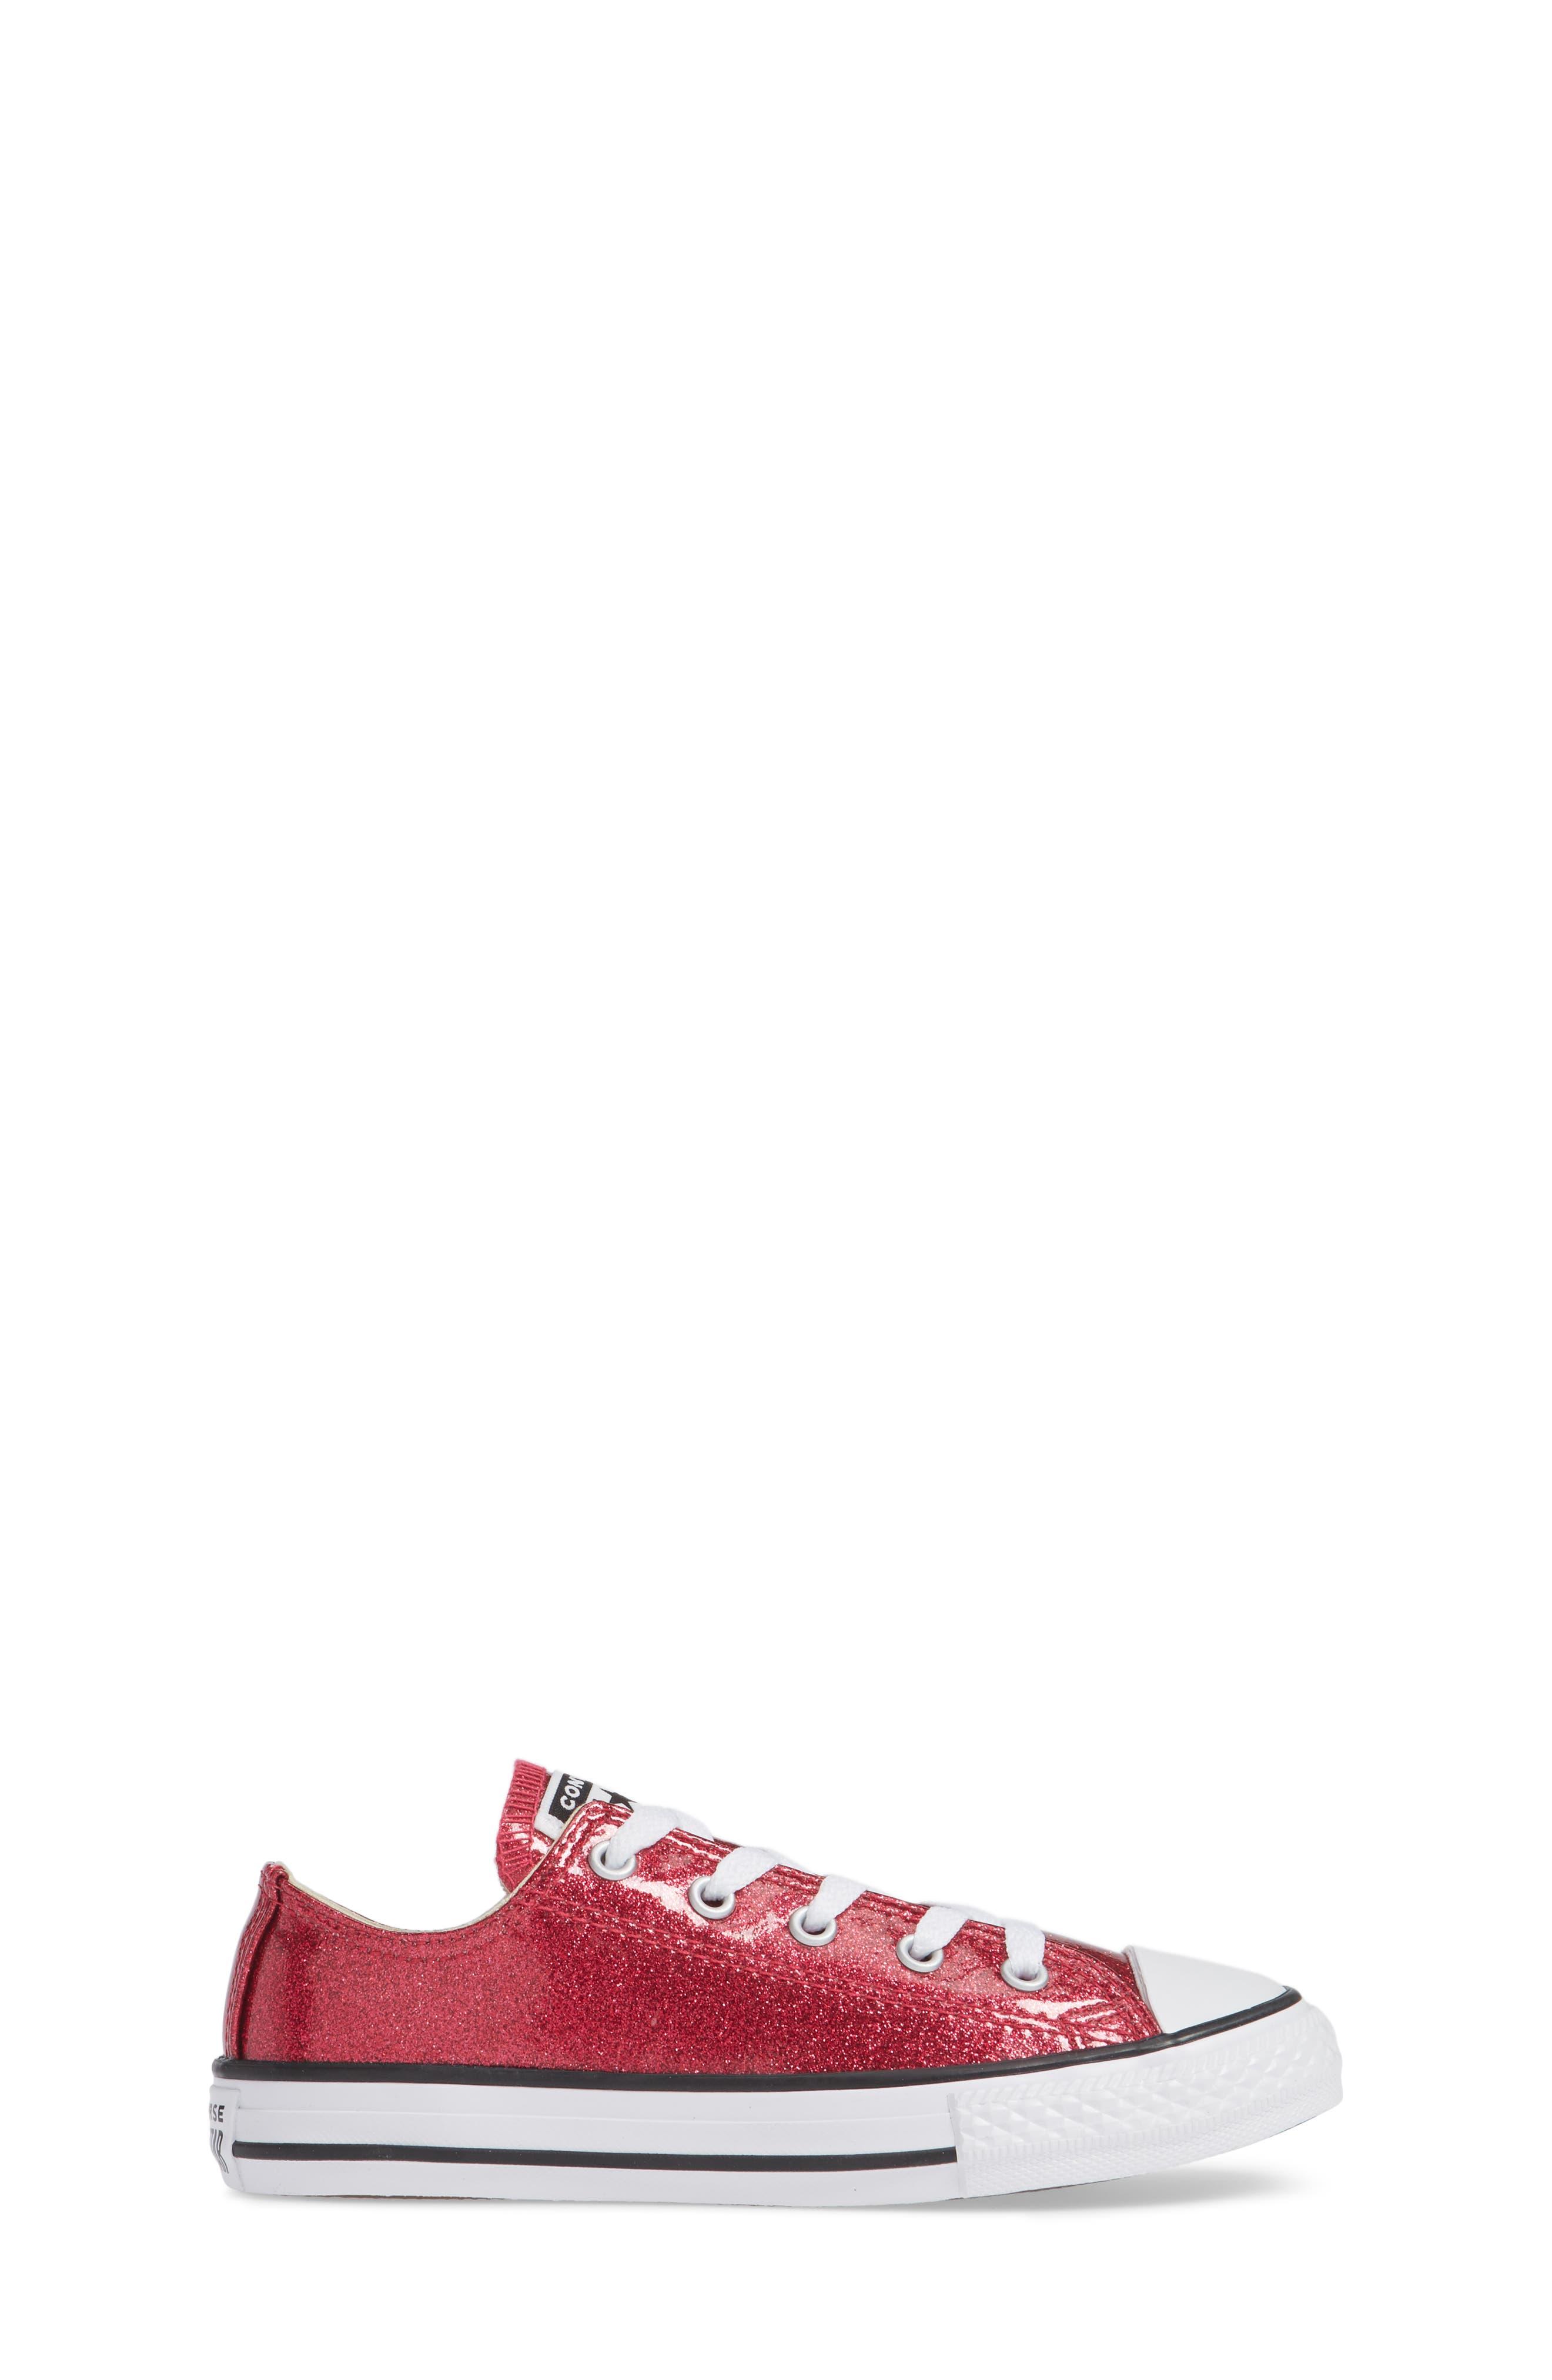 All Star<sup>®</sup> Seasonal Glitter OX Low Top Sneaker,                             Alternate thumbnail 3, color,                             PINK POP